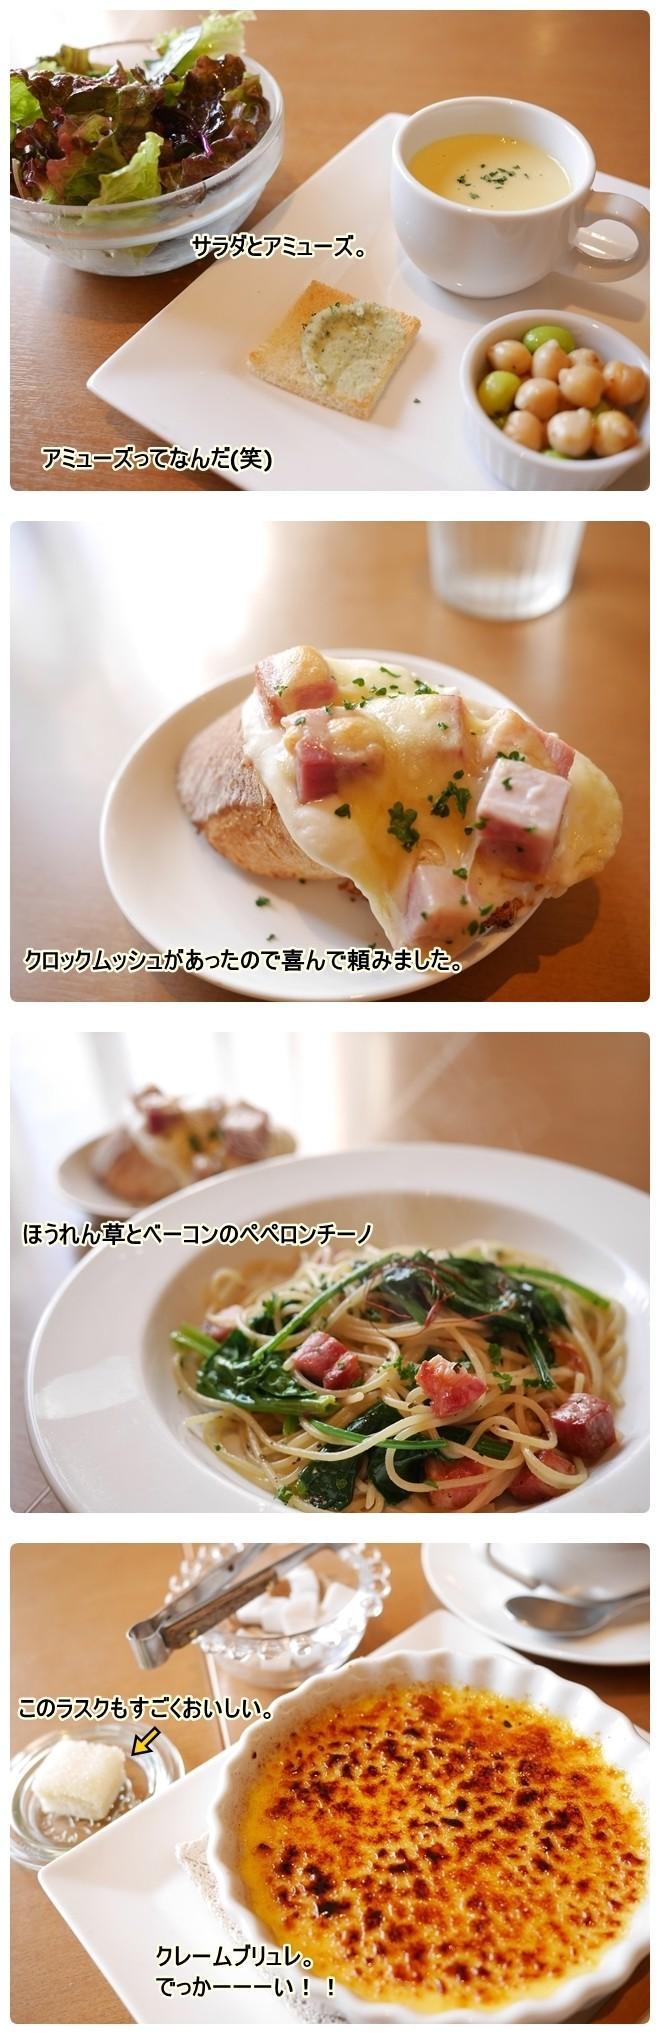 ■P1190143-vert